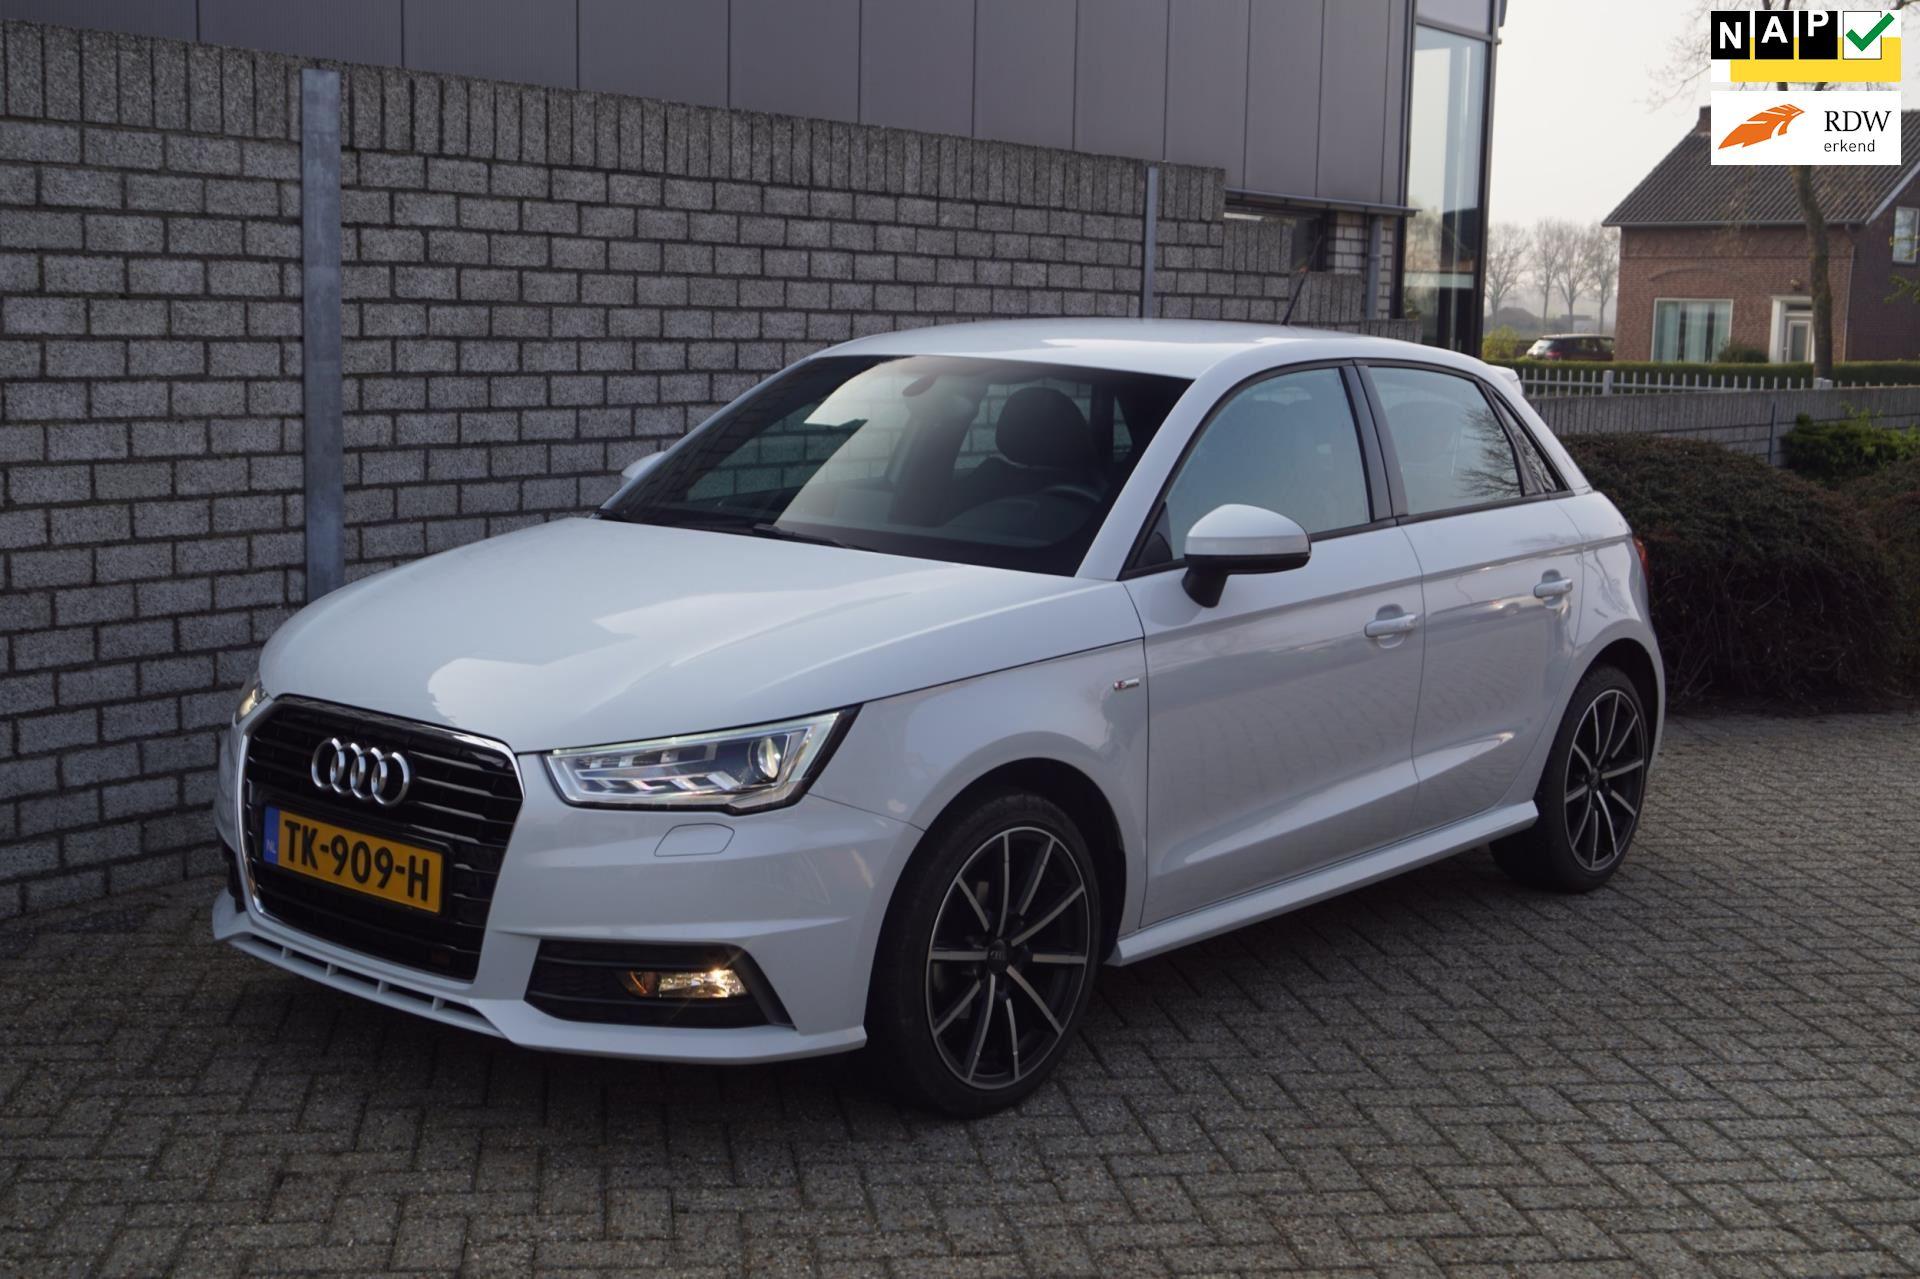 Audi A1 Sportback occasion - Autobedrijf H. Wijdeven V.o.f.